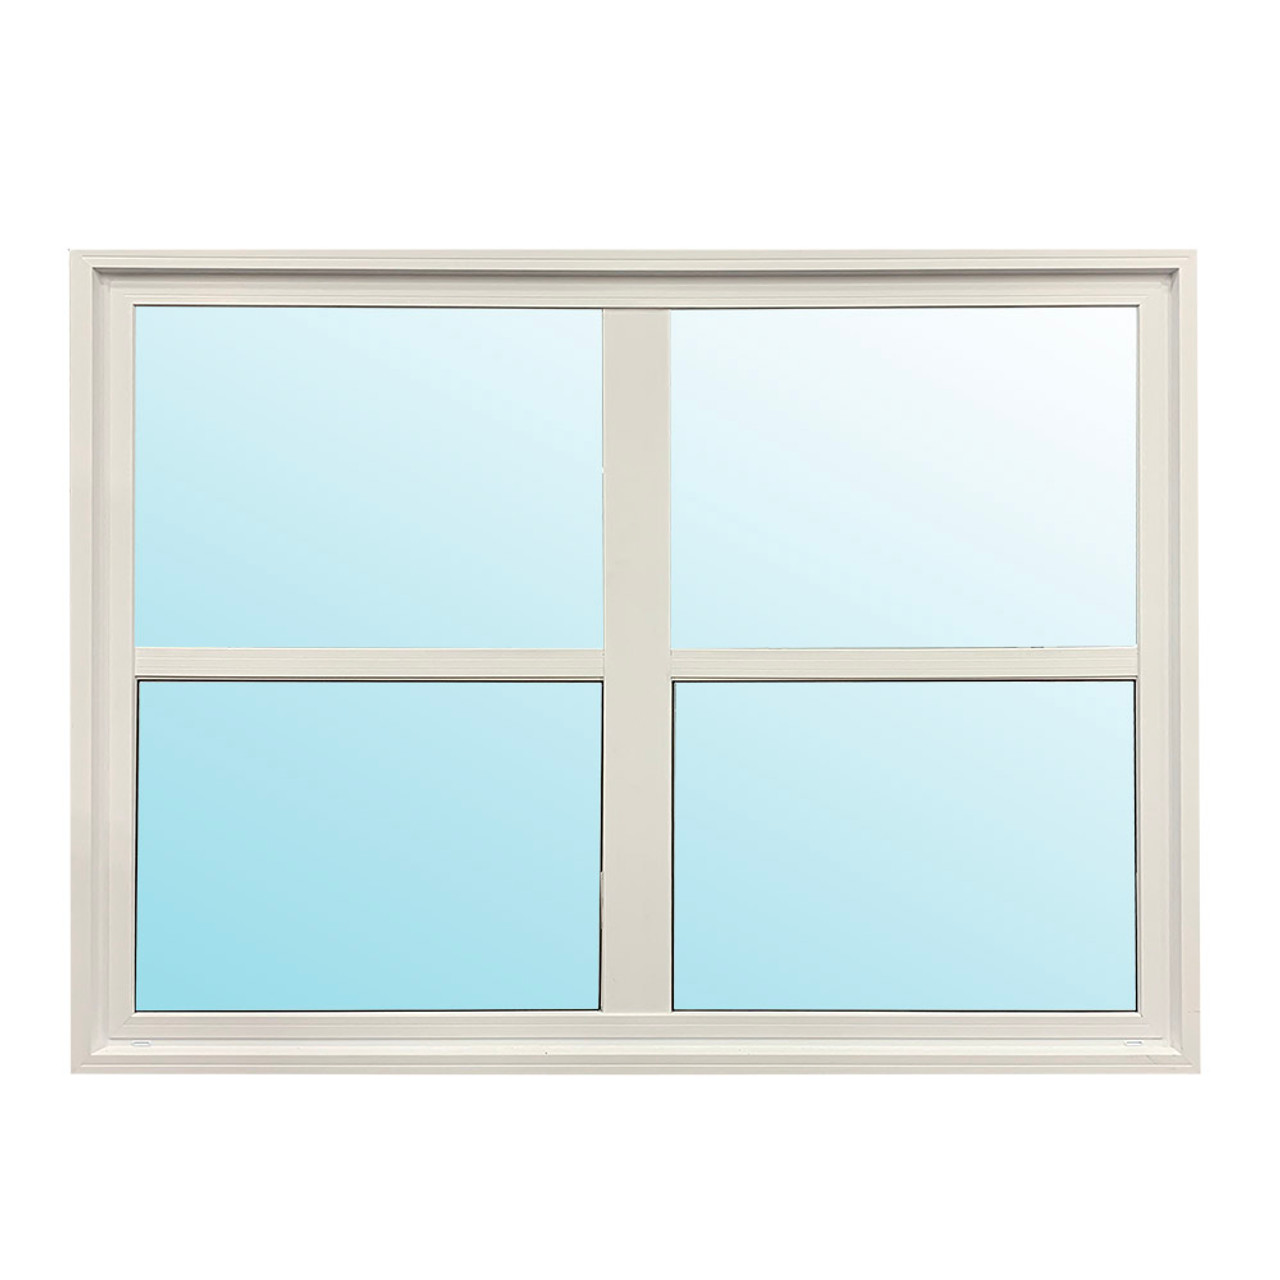 "Castlegard | 72"" x 54"" Single Hung Window | LEA"